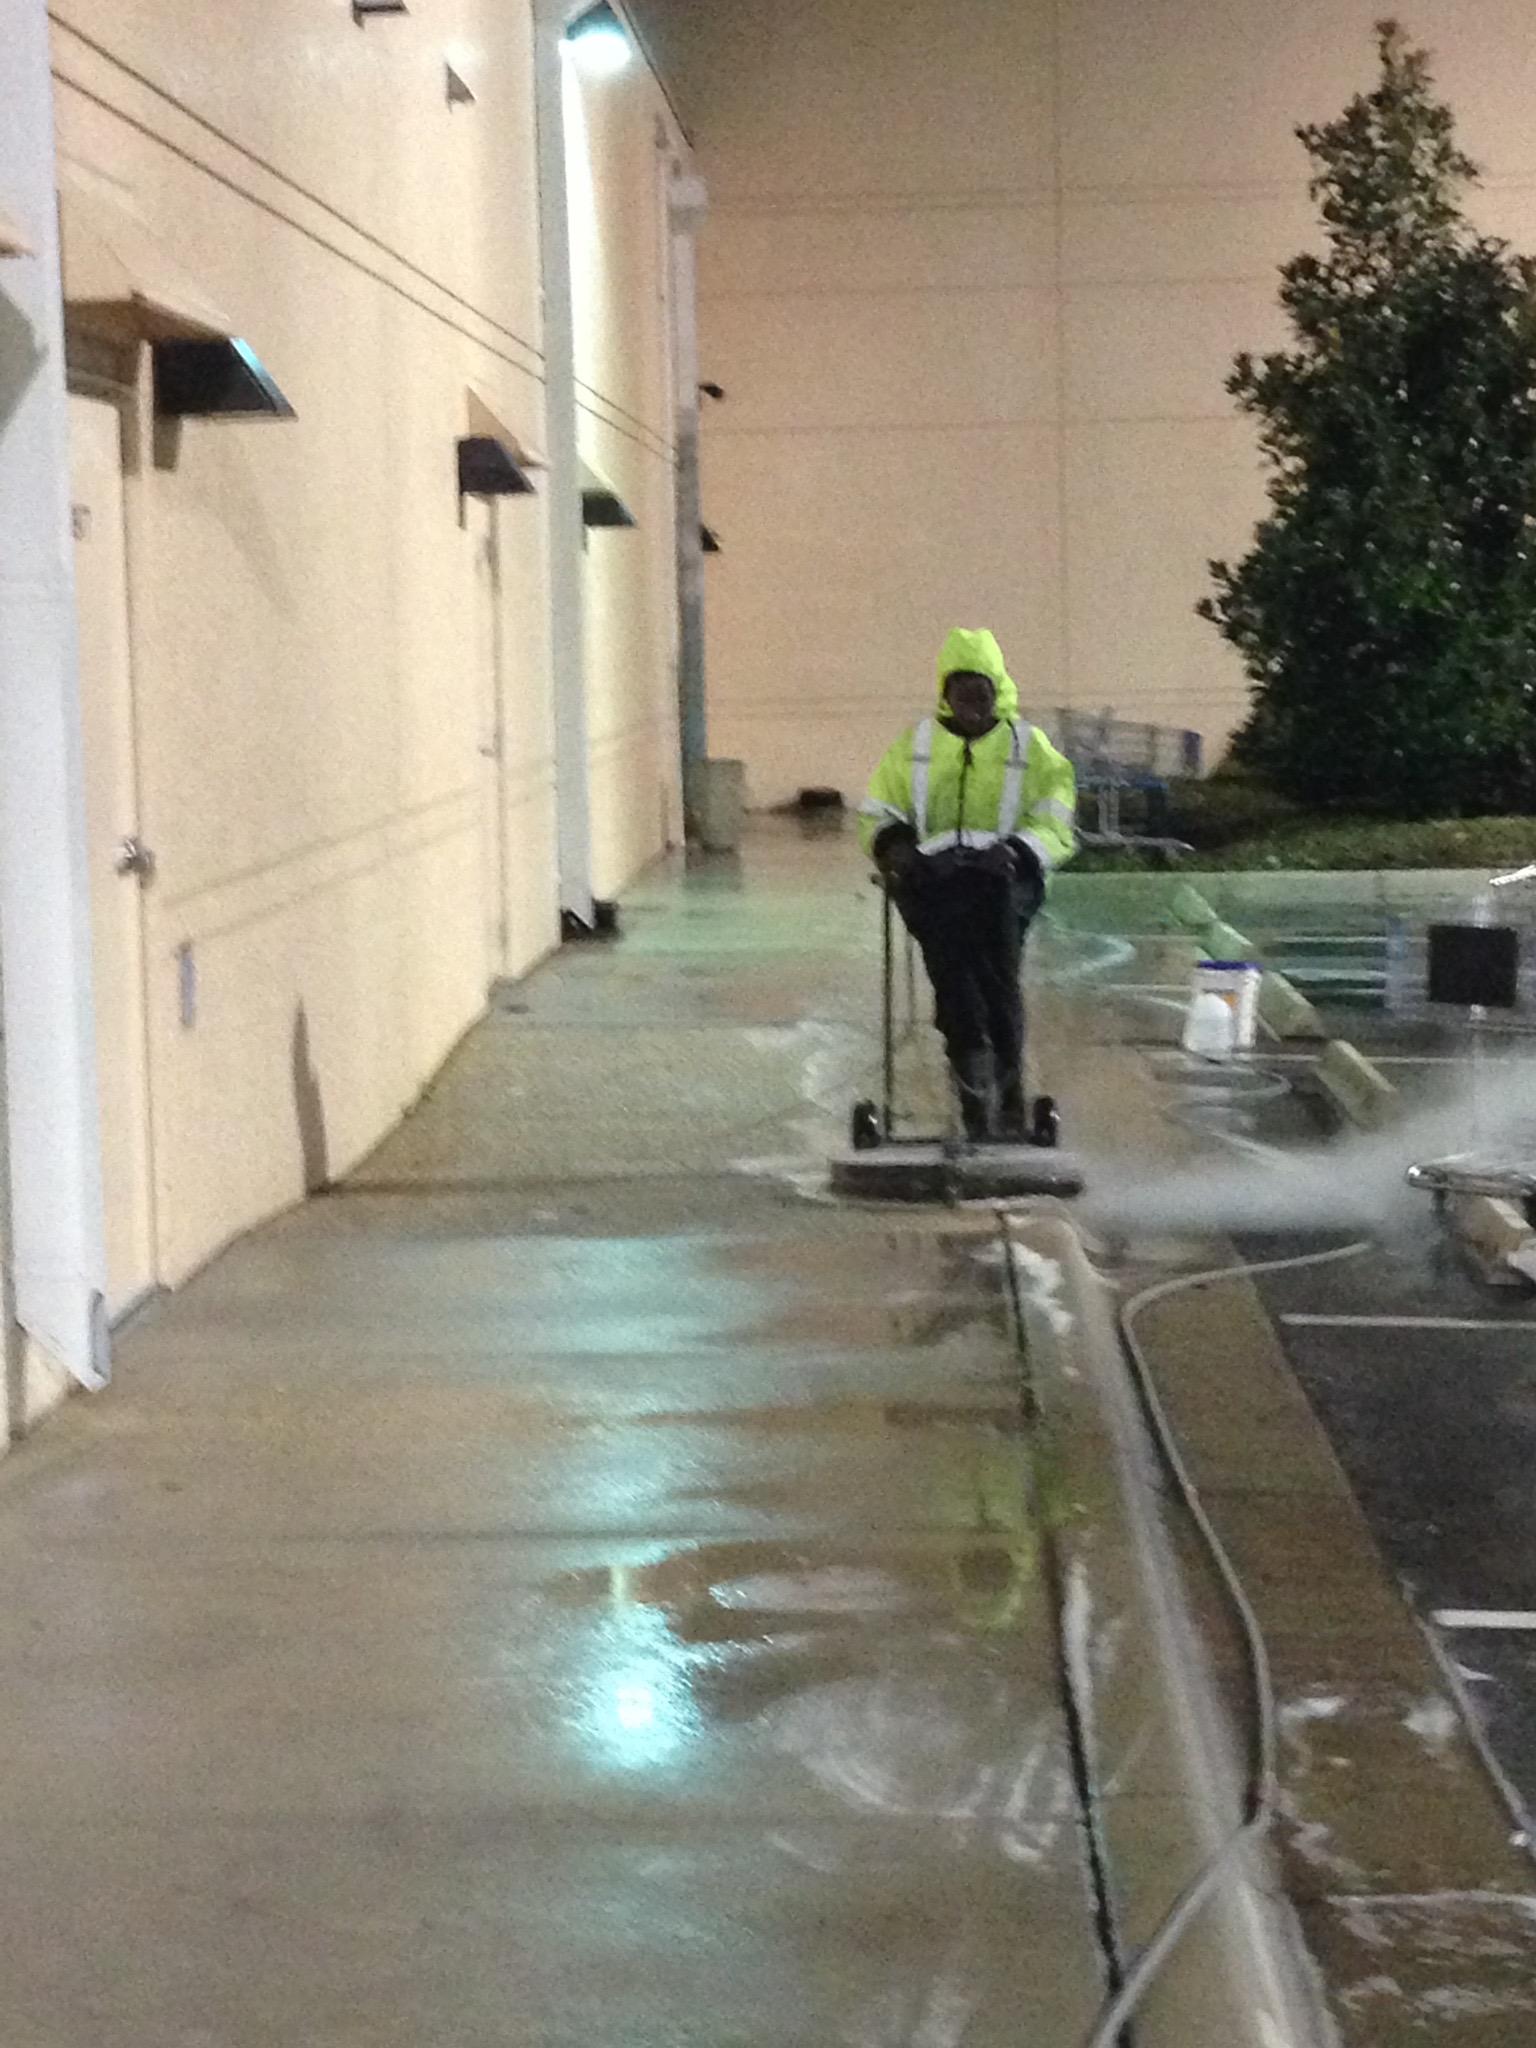 pressure washing sidewalks in Orlando